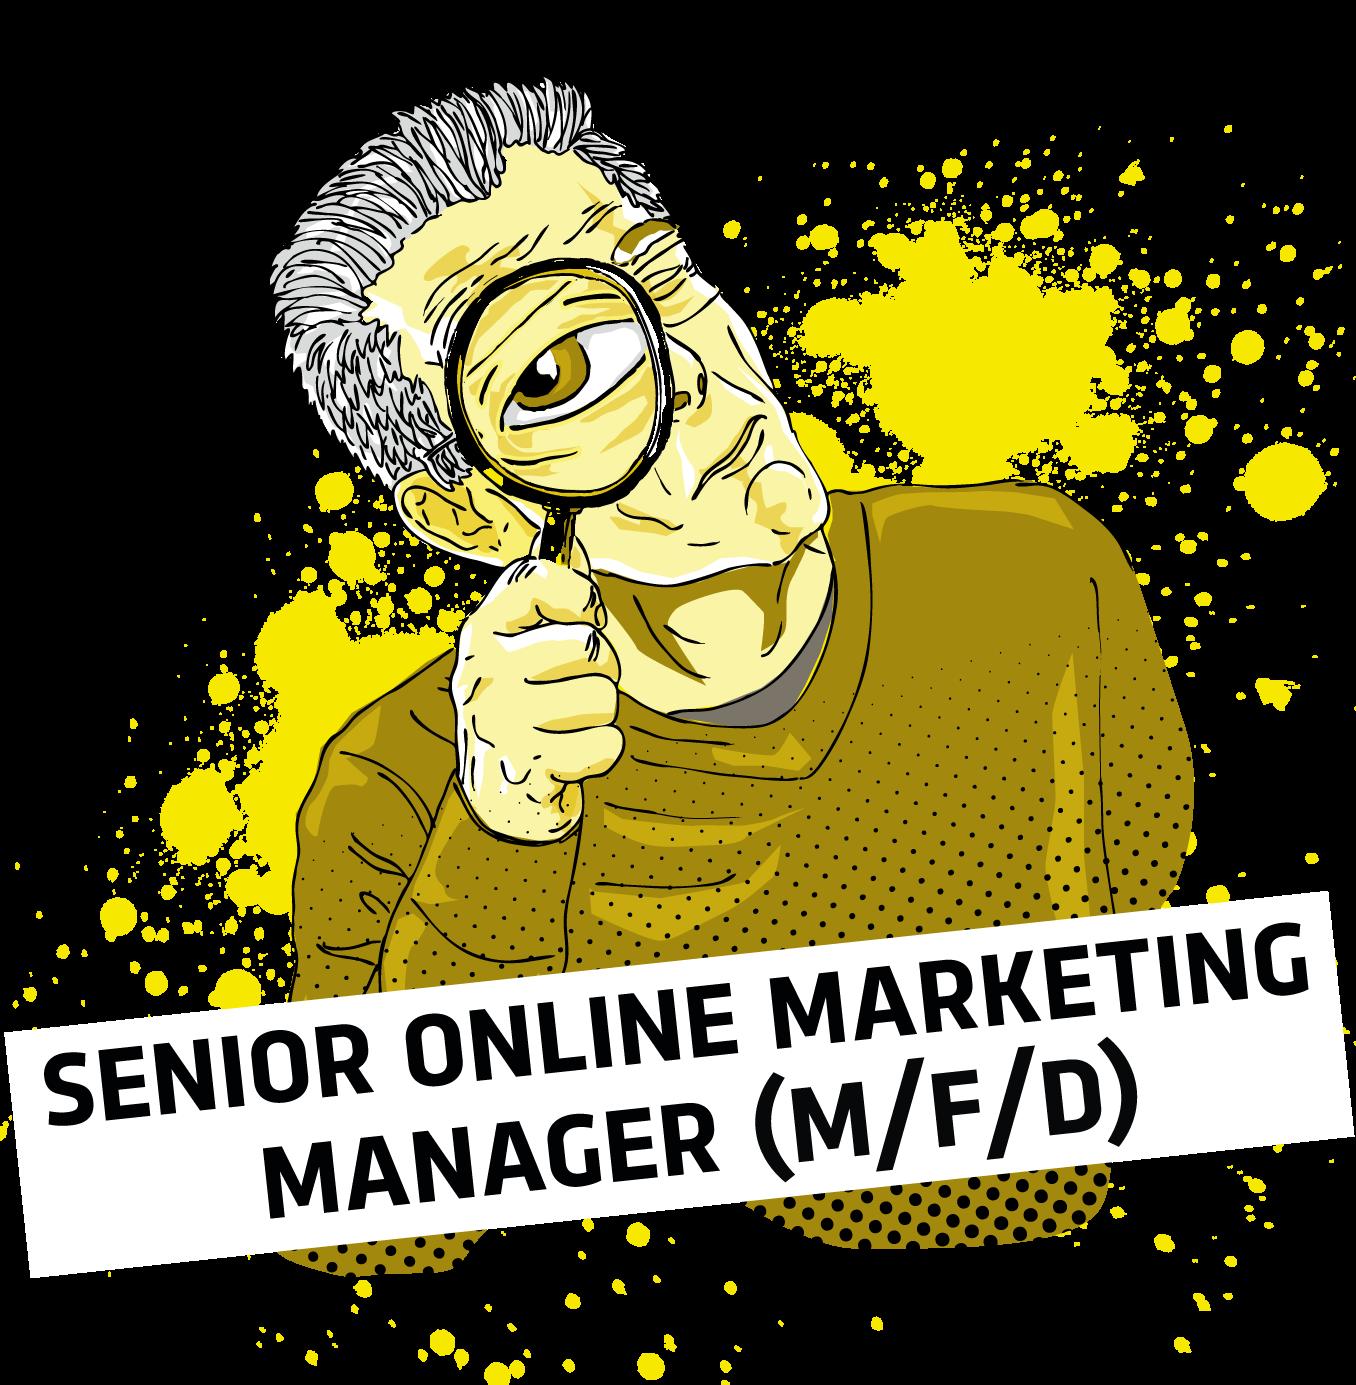 Senior Online Marketing Manager